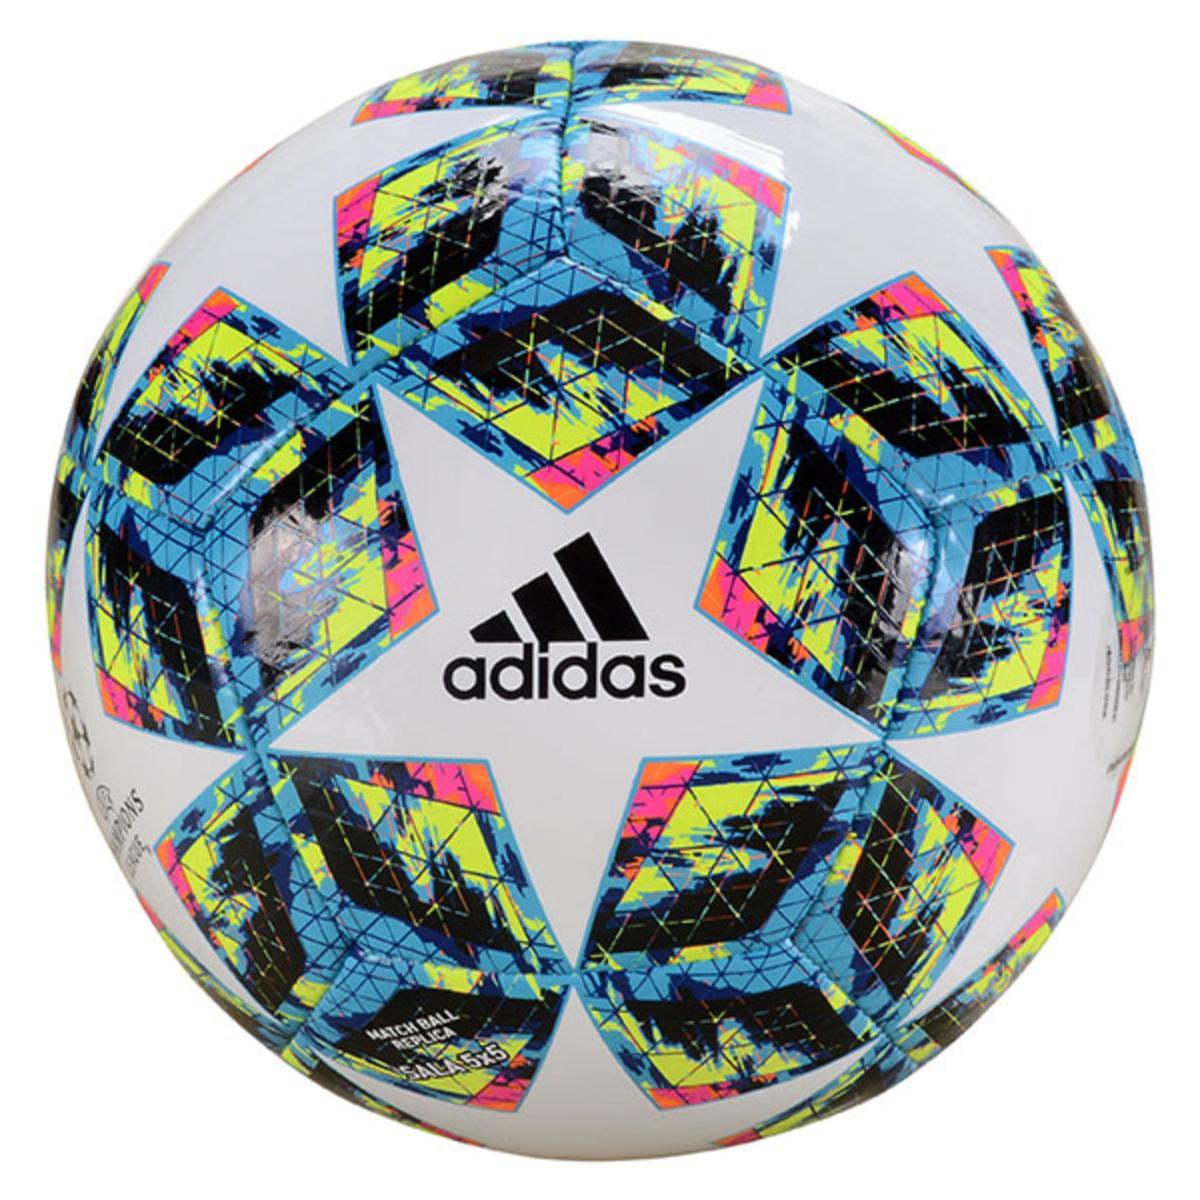 Bola Unisex Adidas Dy2548 Finale Ucl Futsal 5x5 Branco Color